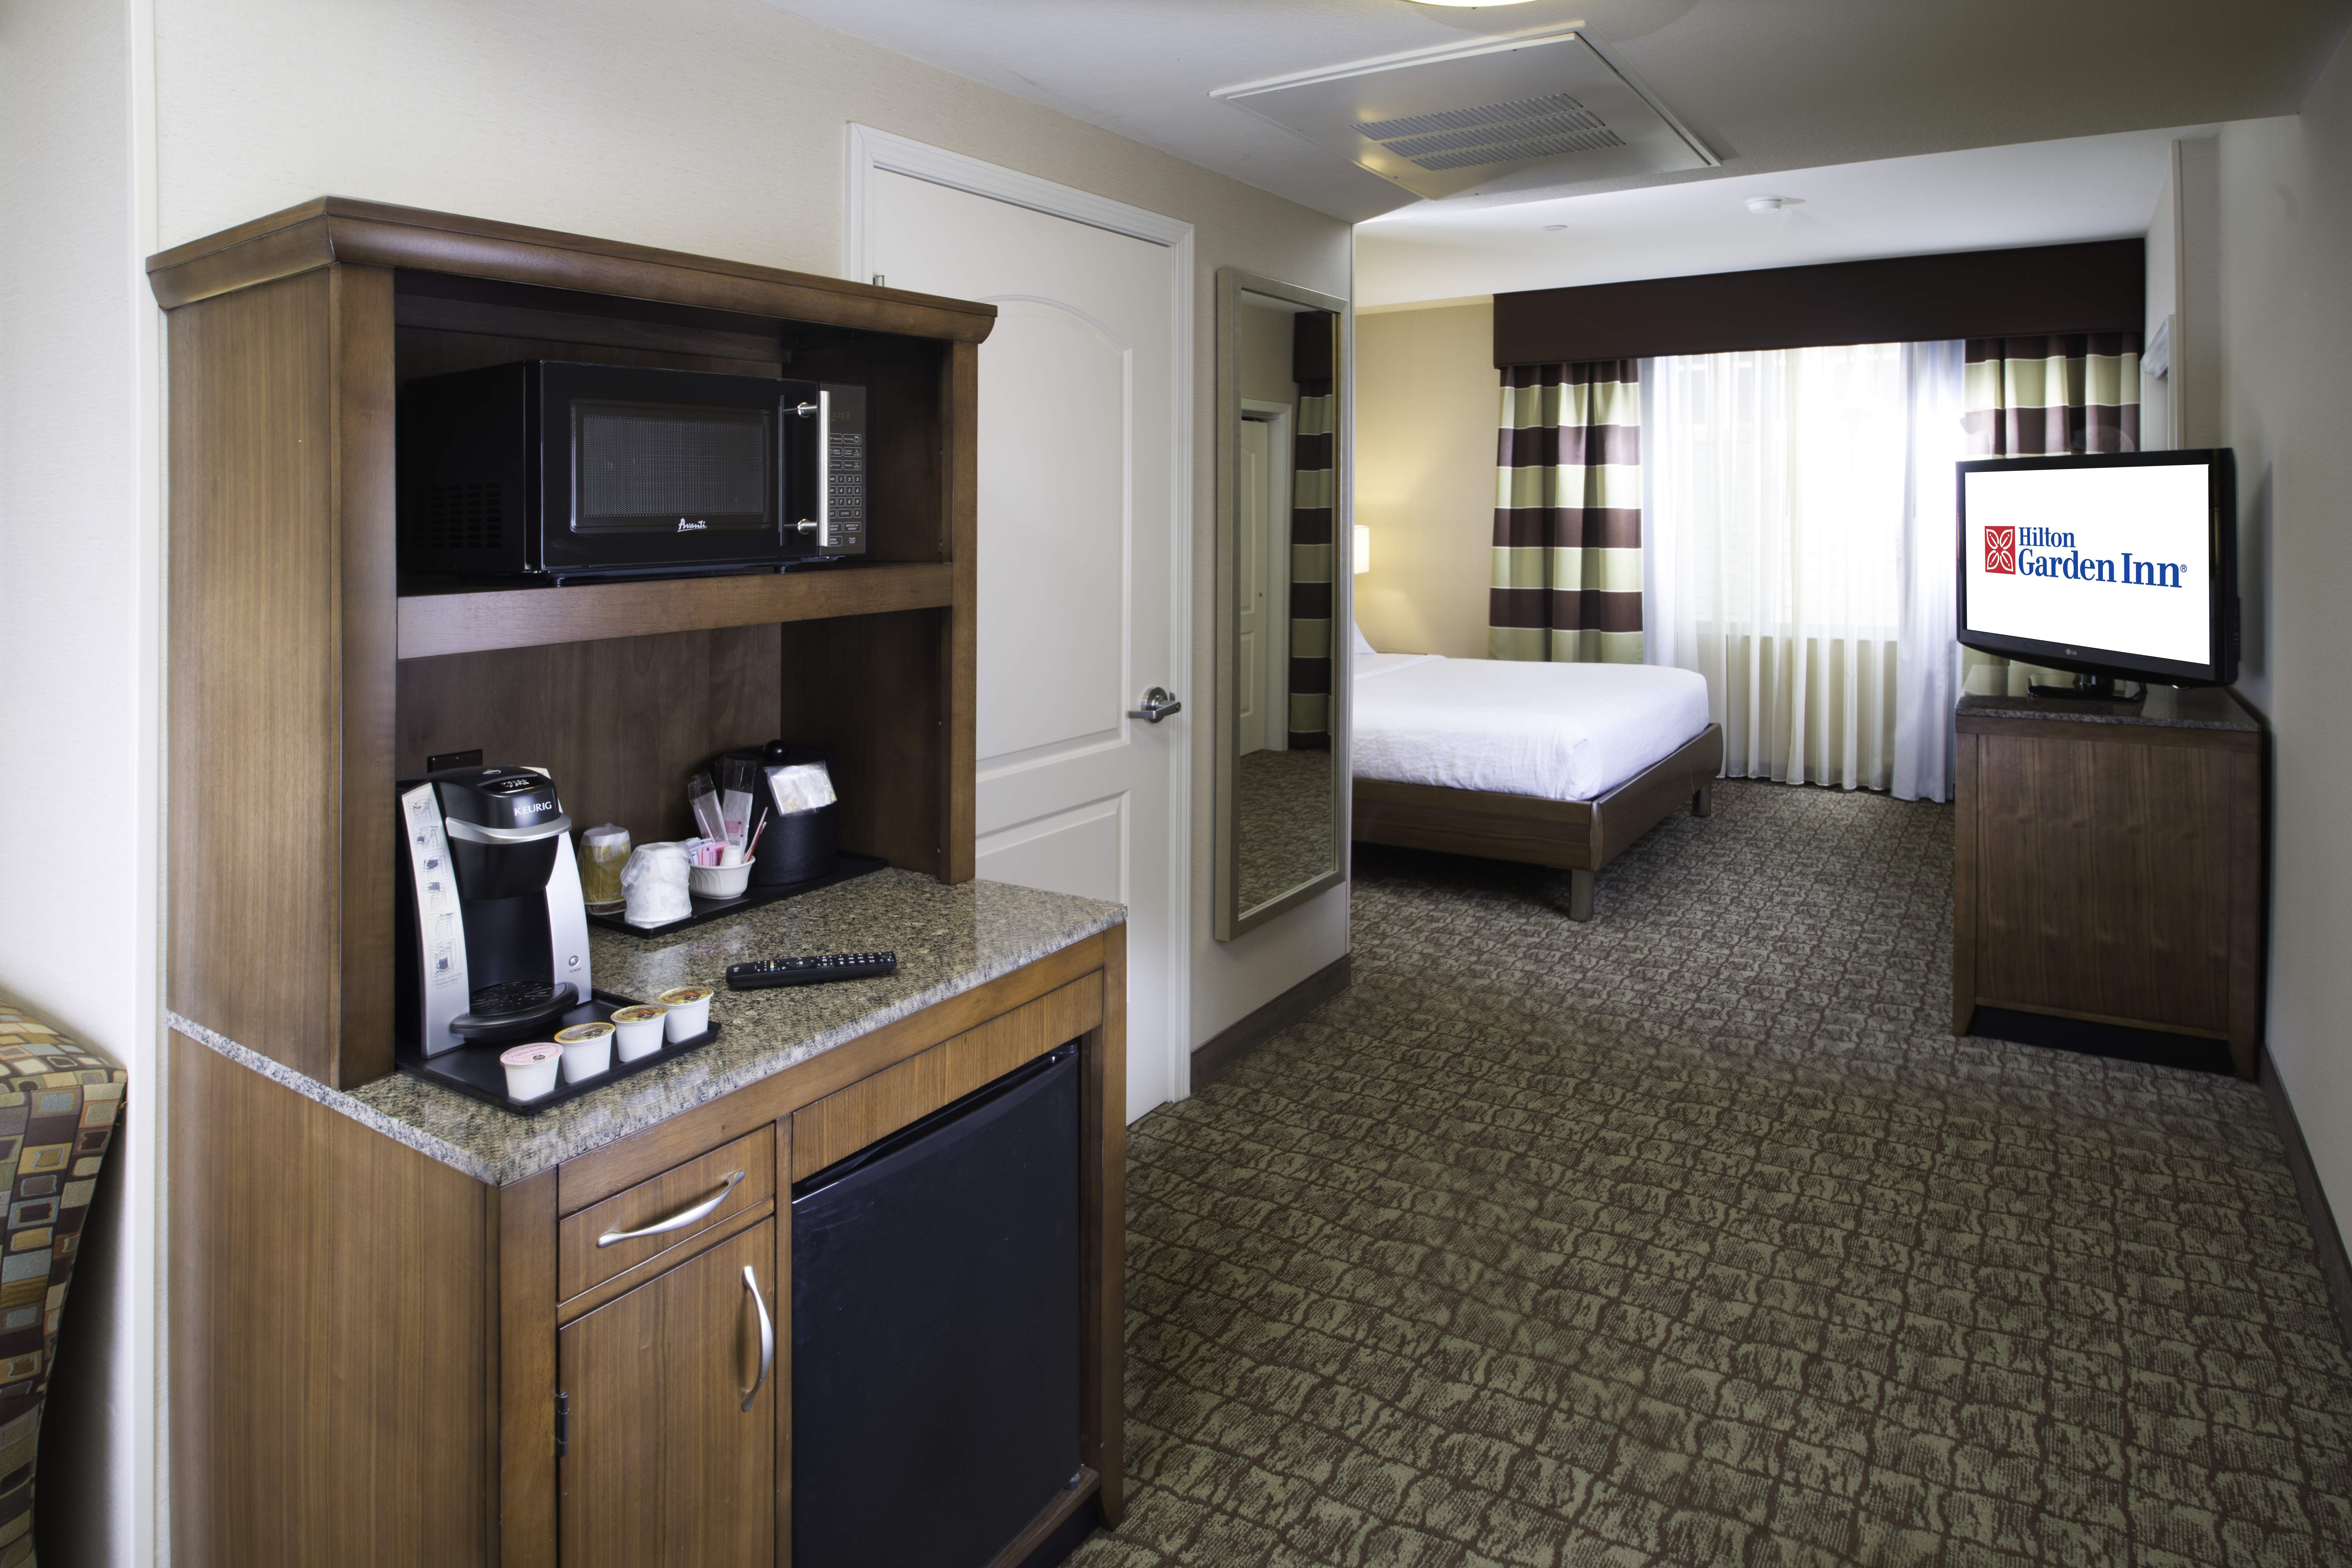 Hilton Garden Inn Boise Spectrum In Boise Id Whitepages